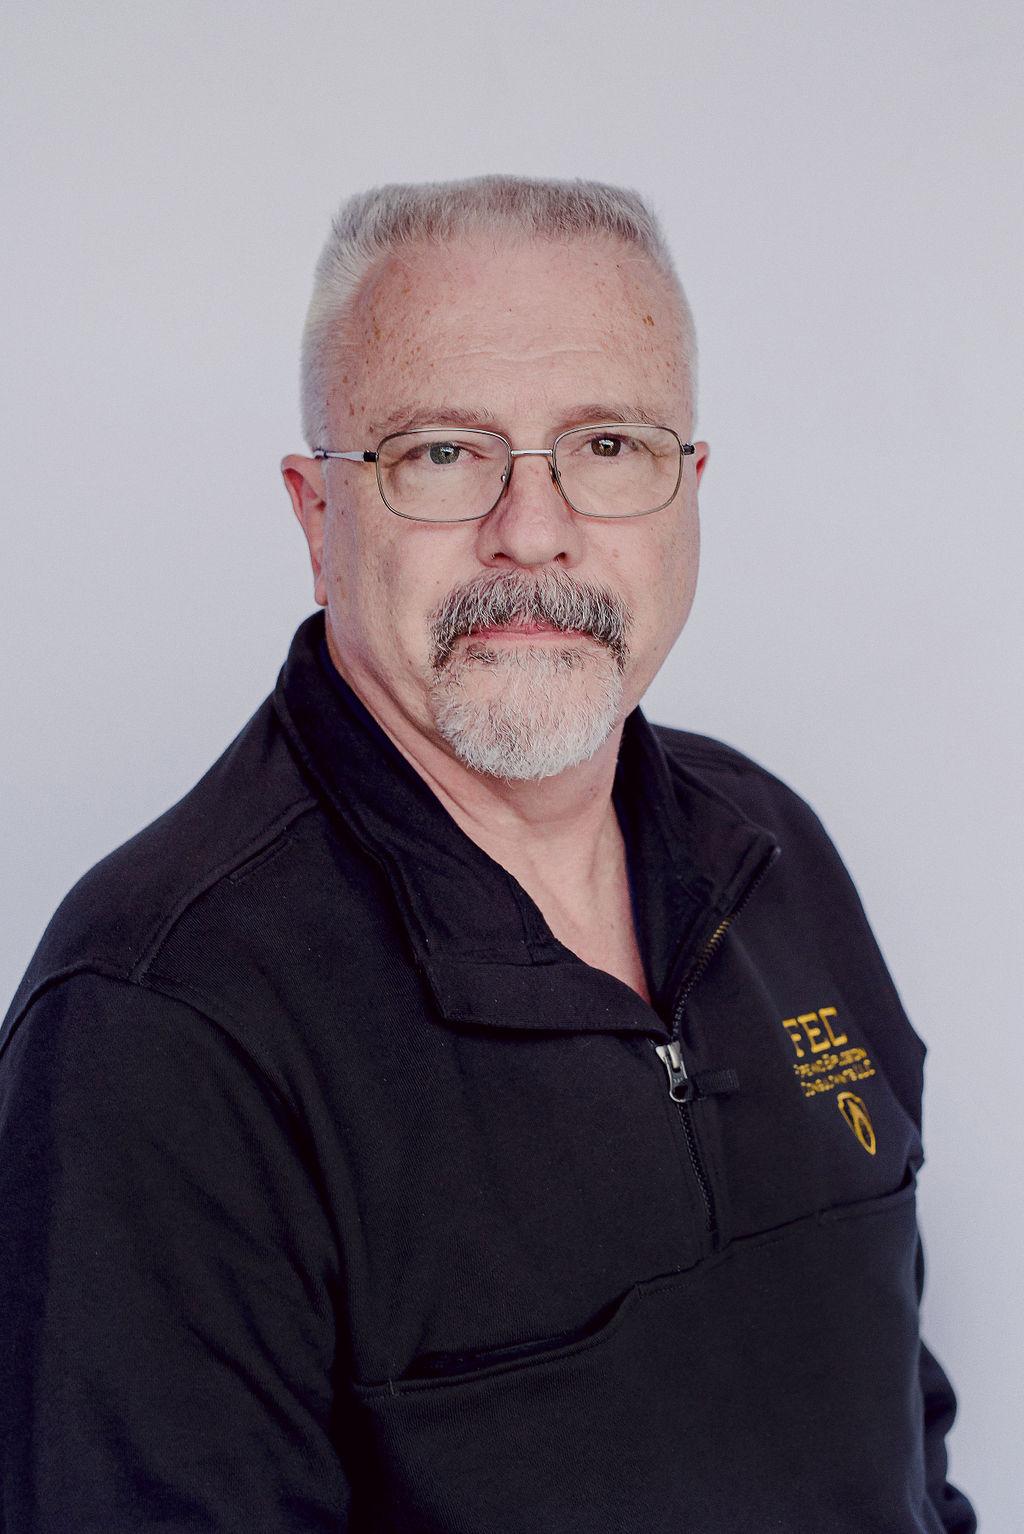 Rick Summerfield